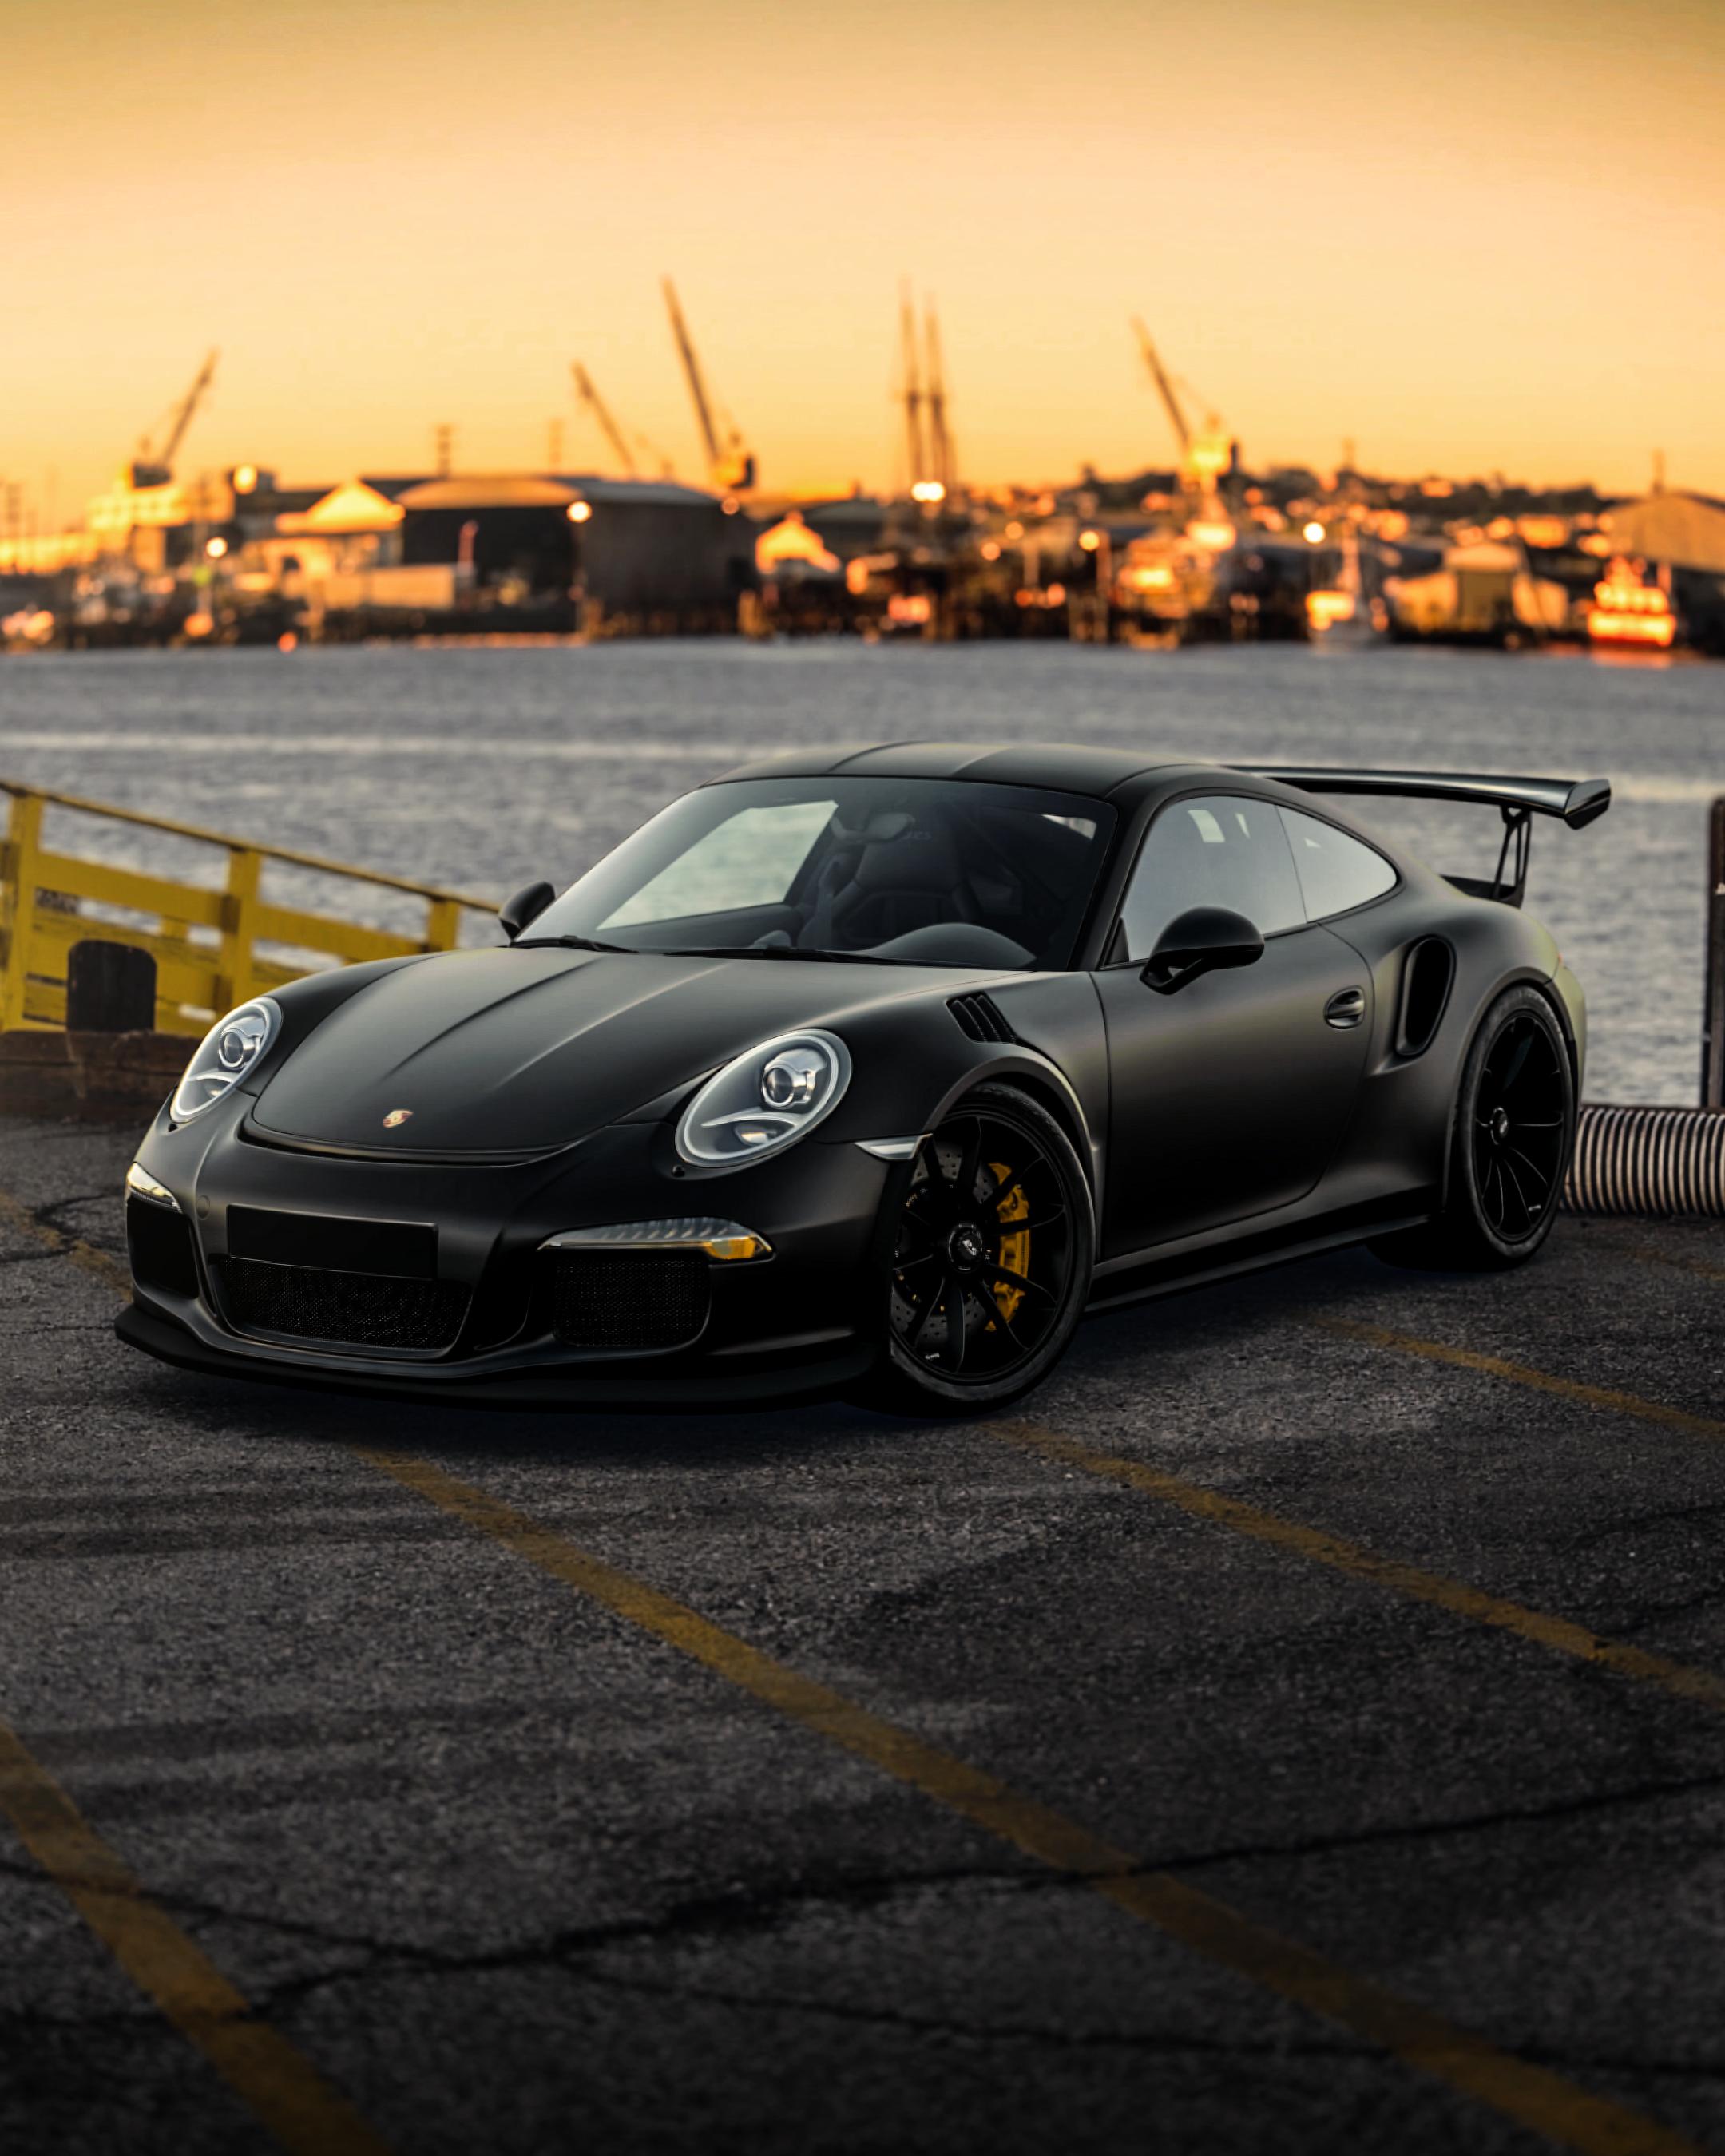 Black Porsche 911 On Road During Daytime Photo Free Automobile Image On Unsplash